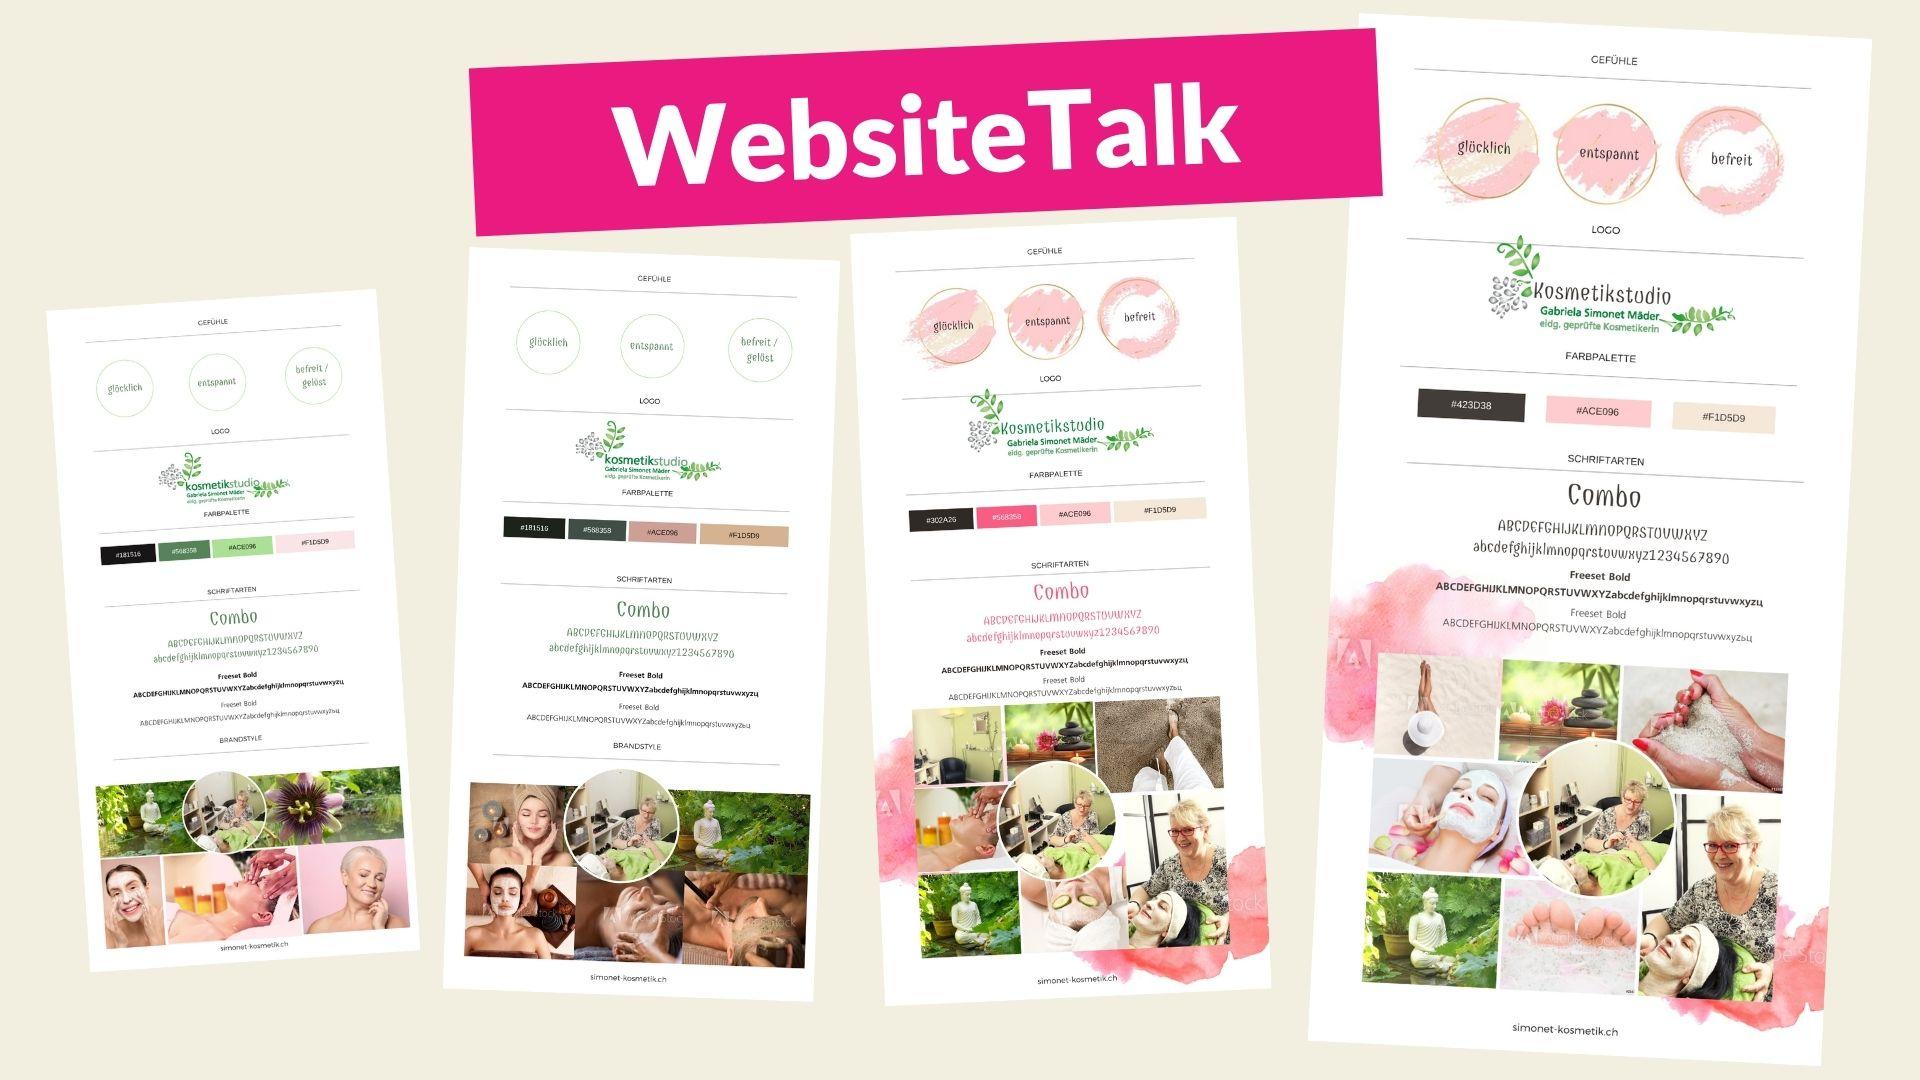 WebsiteTalk 1